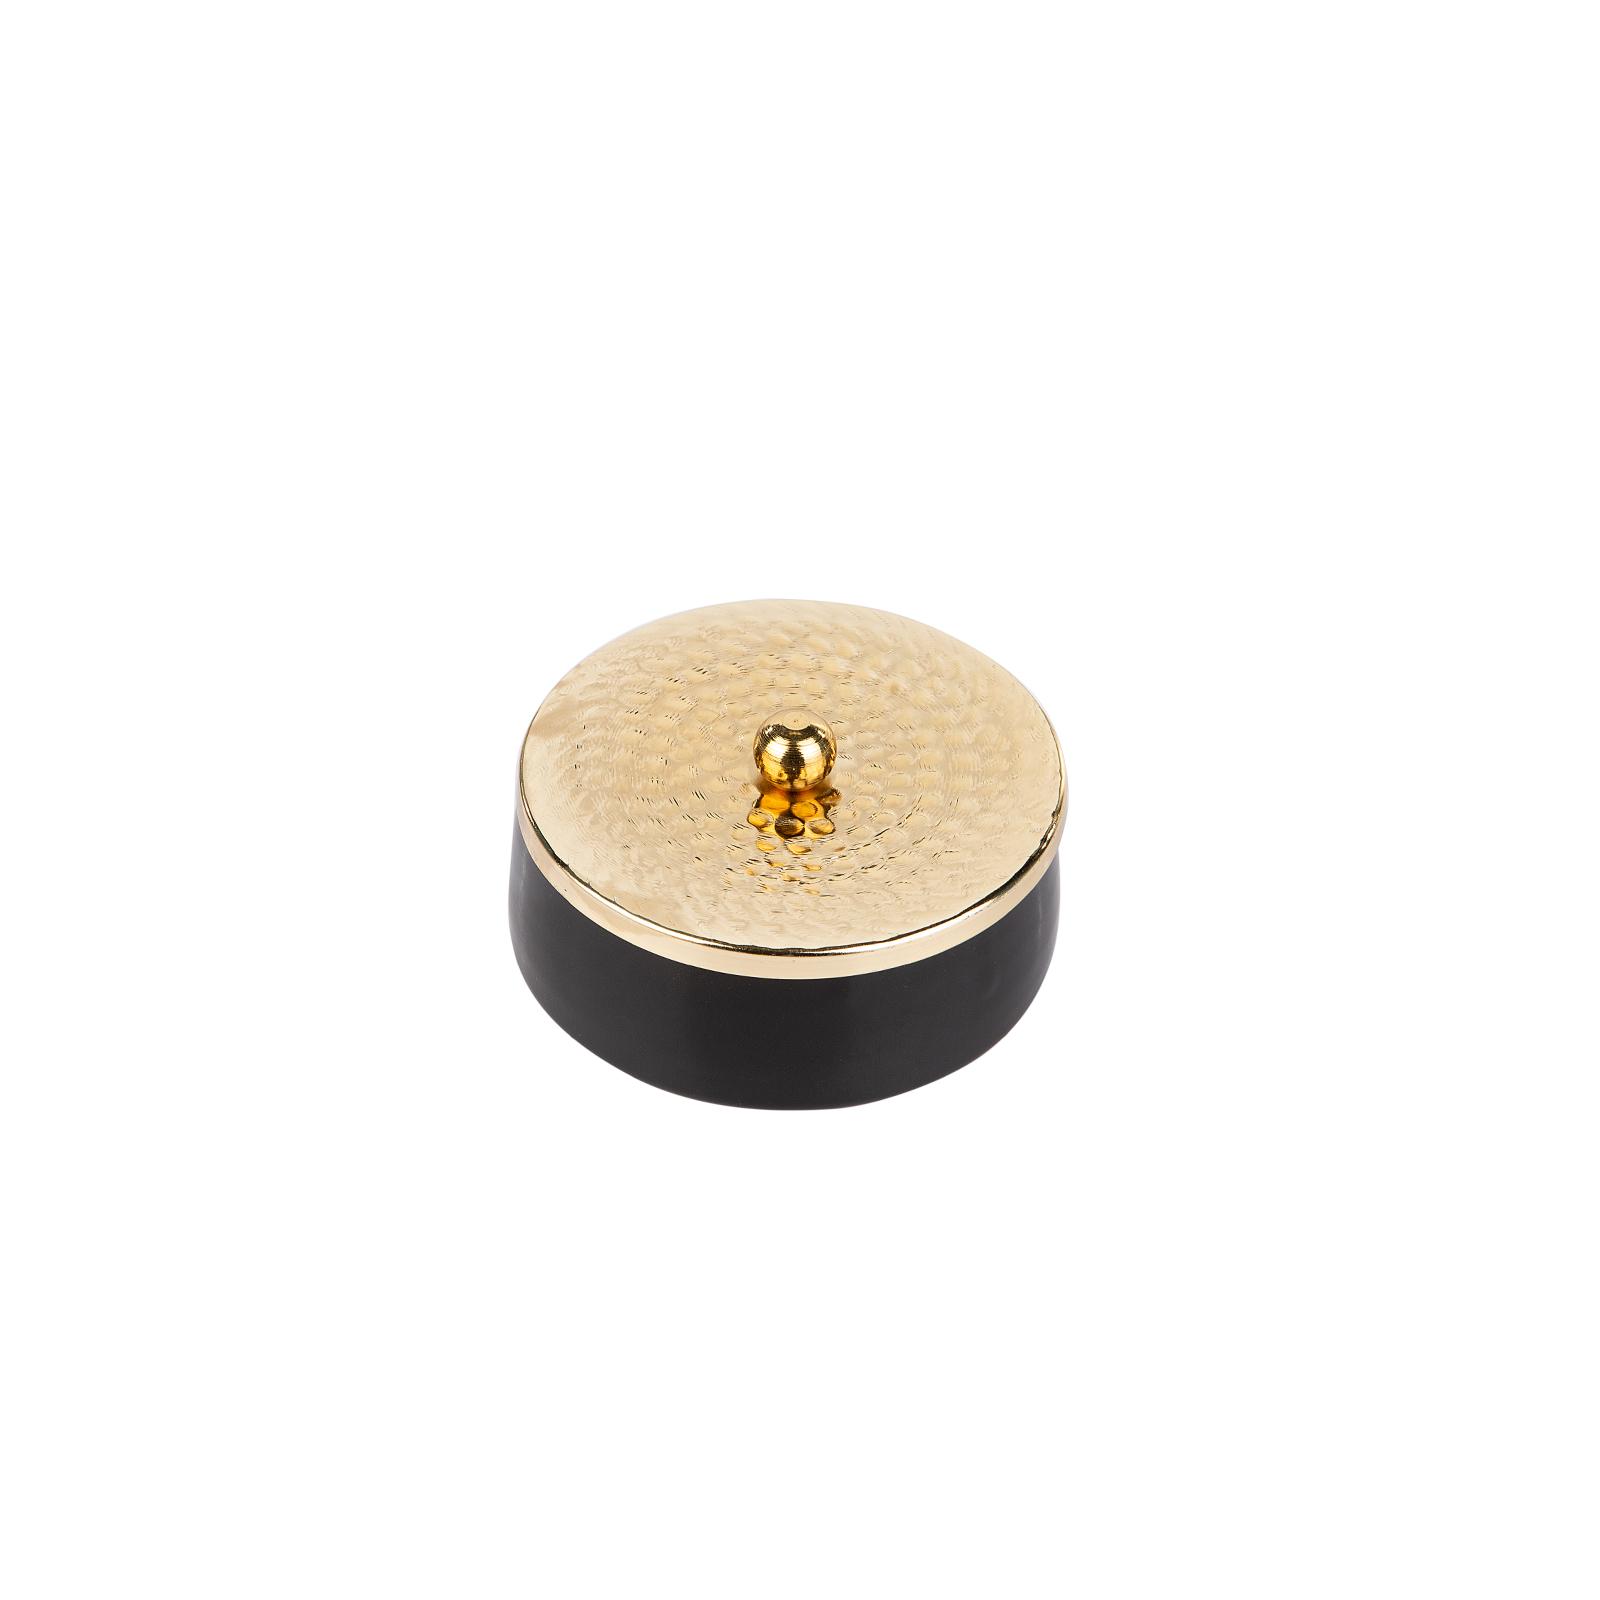 Karaca Gold Kapaklı Seramik Dekoratif Tabak